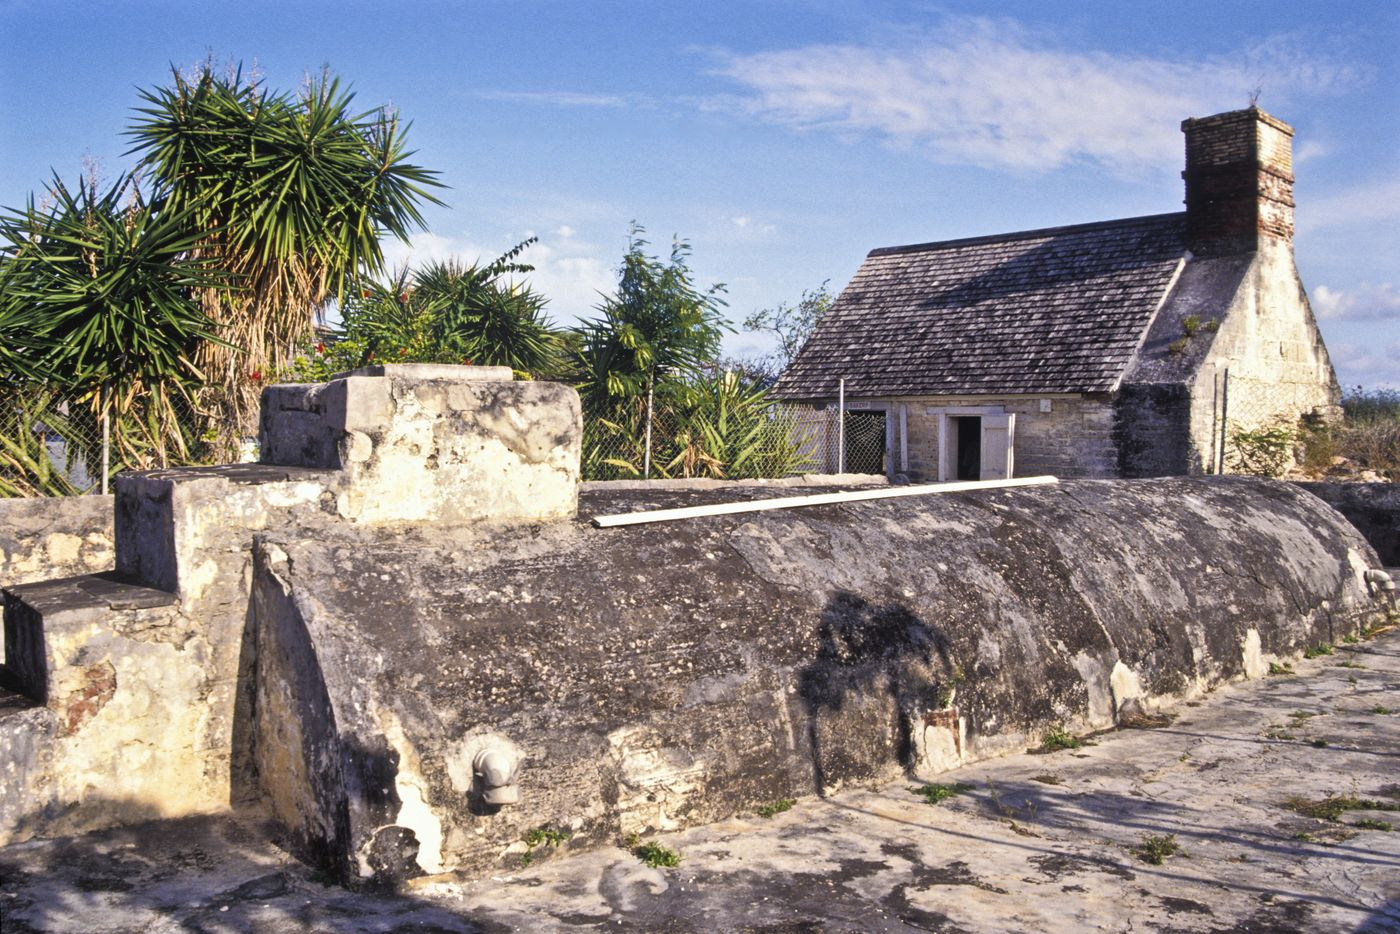 Photo Tour of Anguilla 6